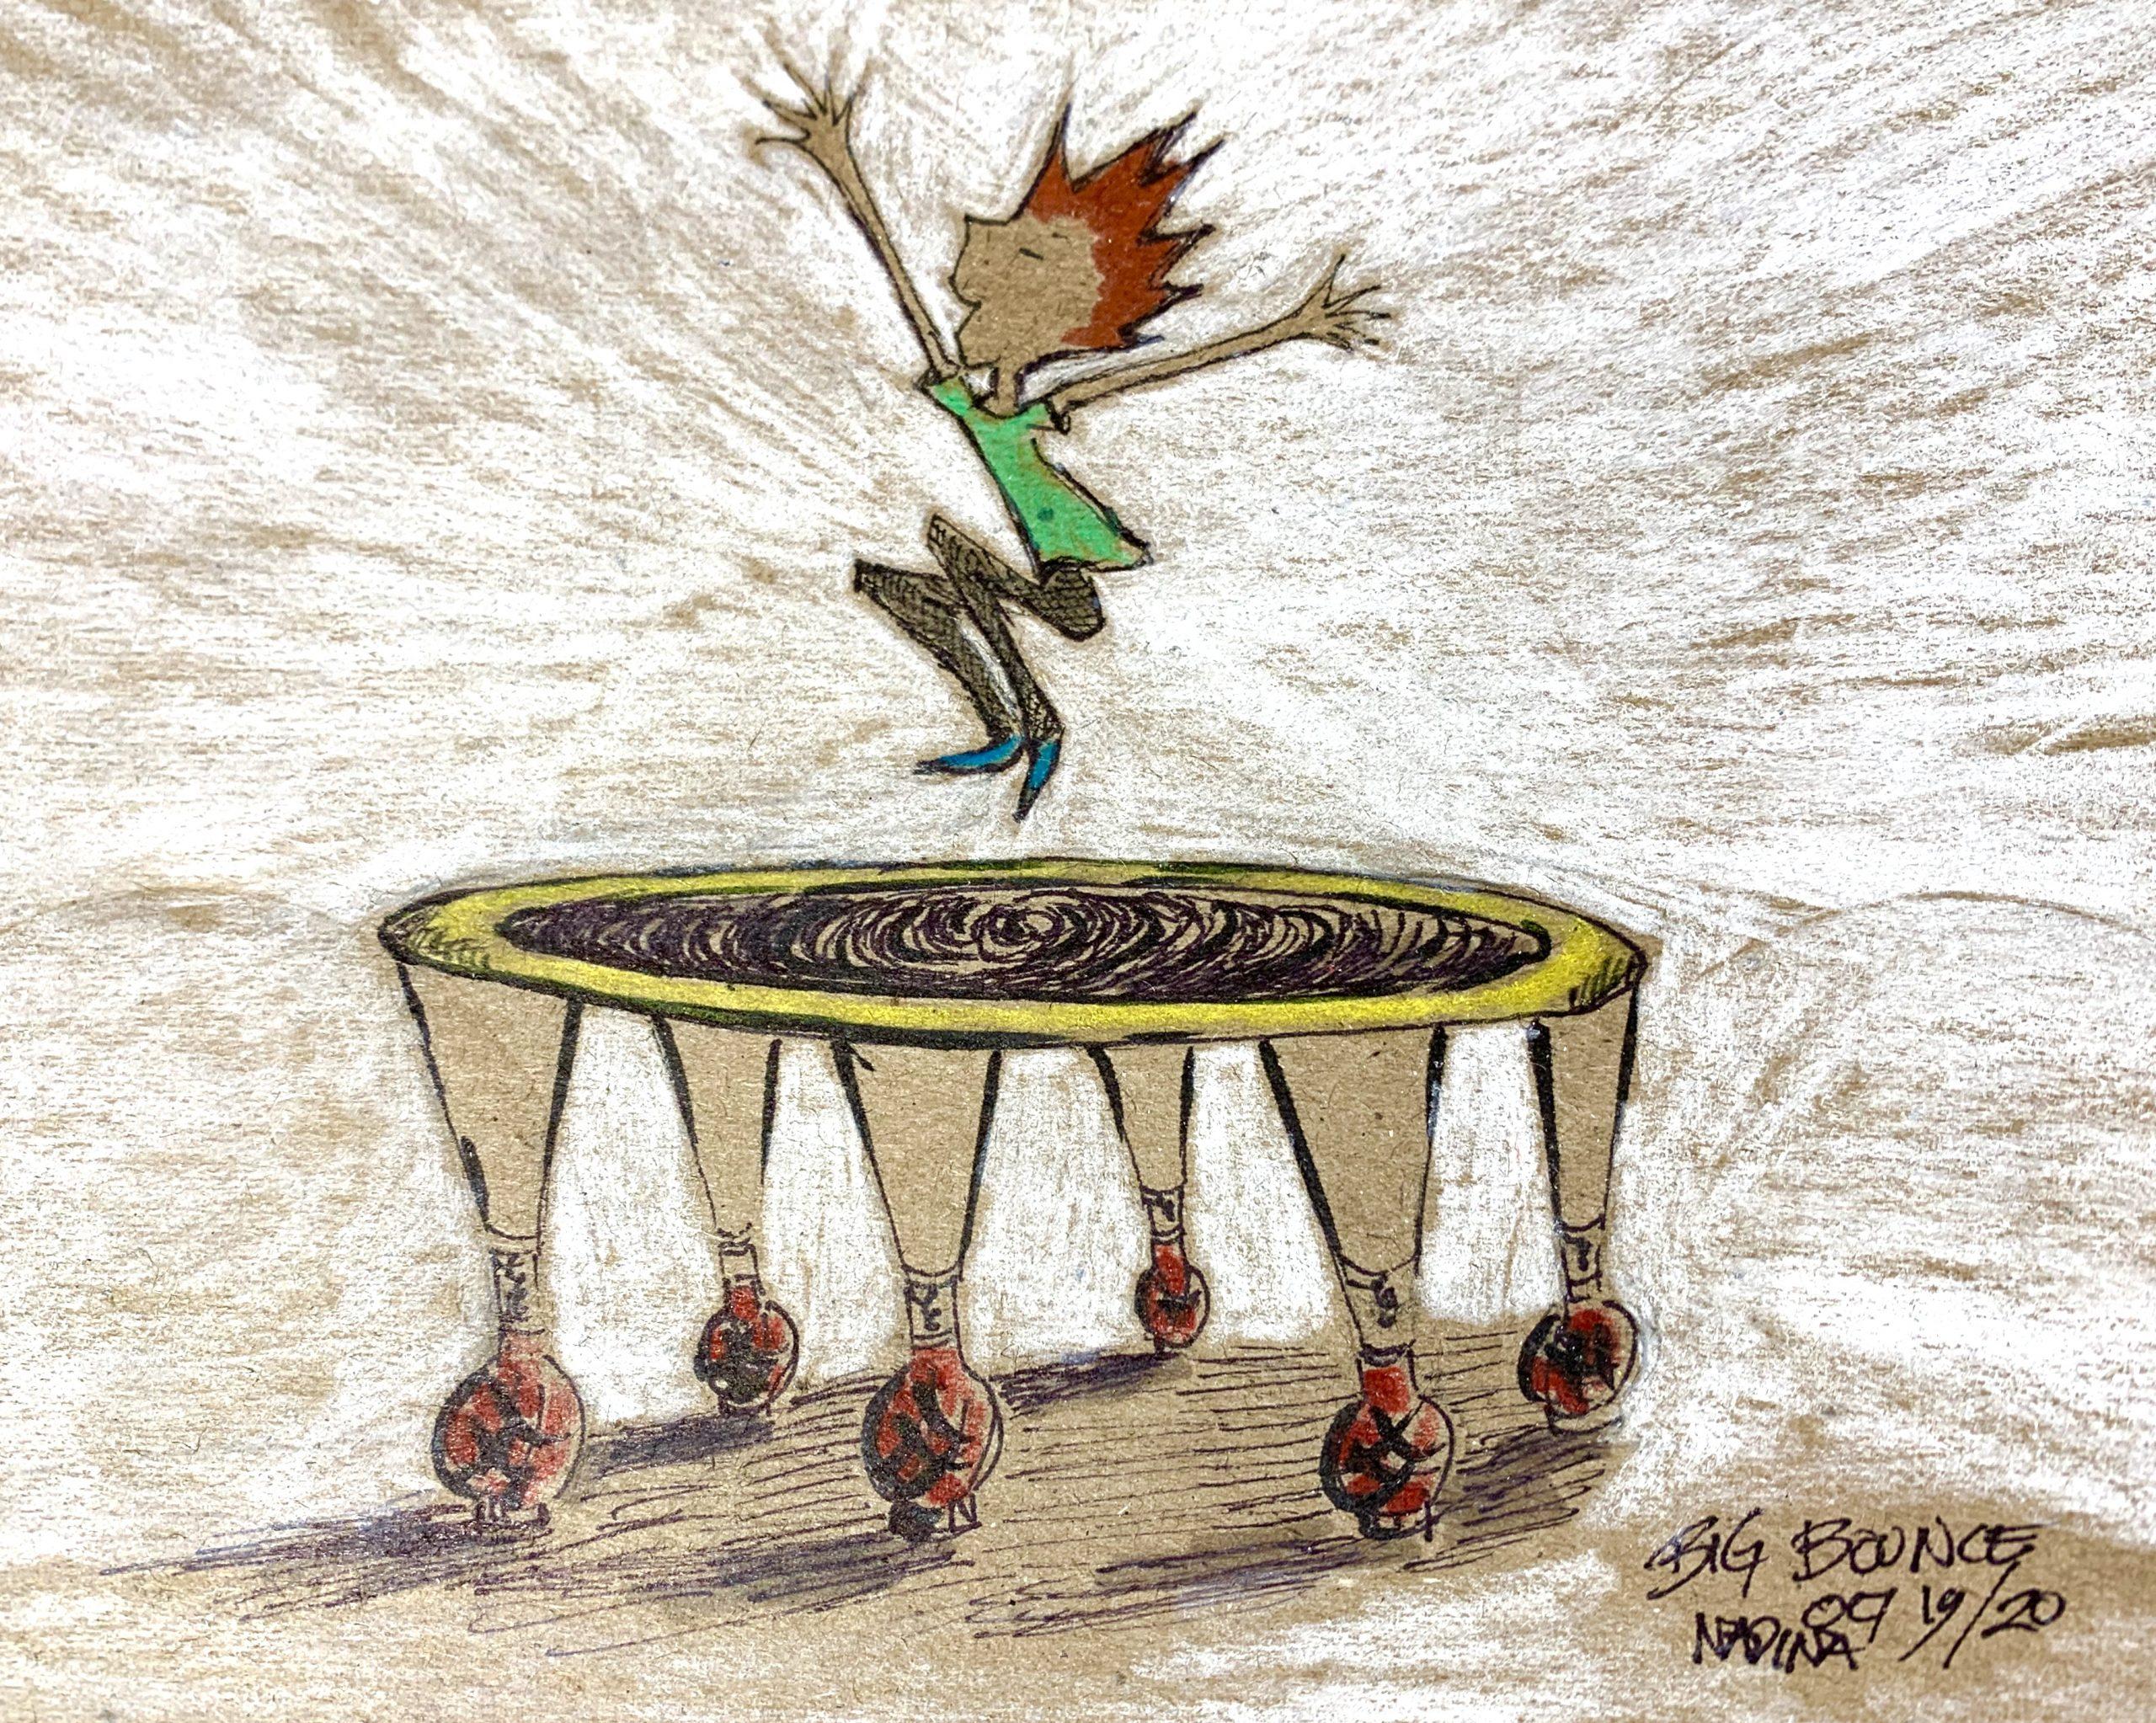 Reed membrane, reed trampoline, bassoon reed